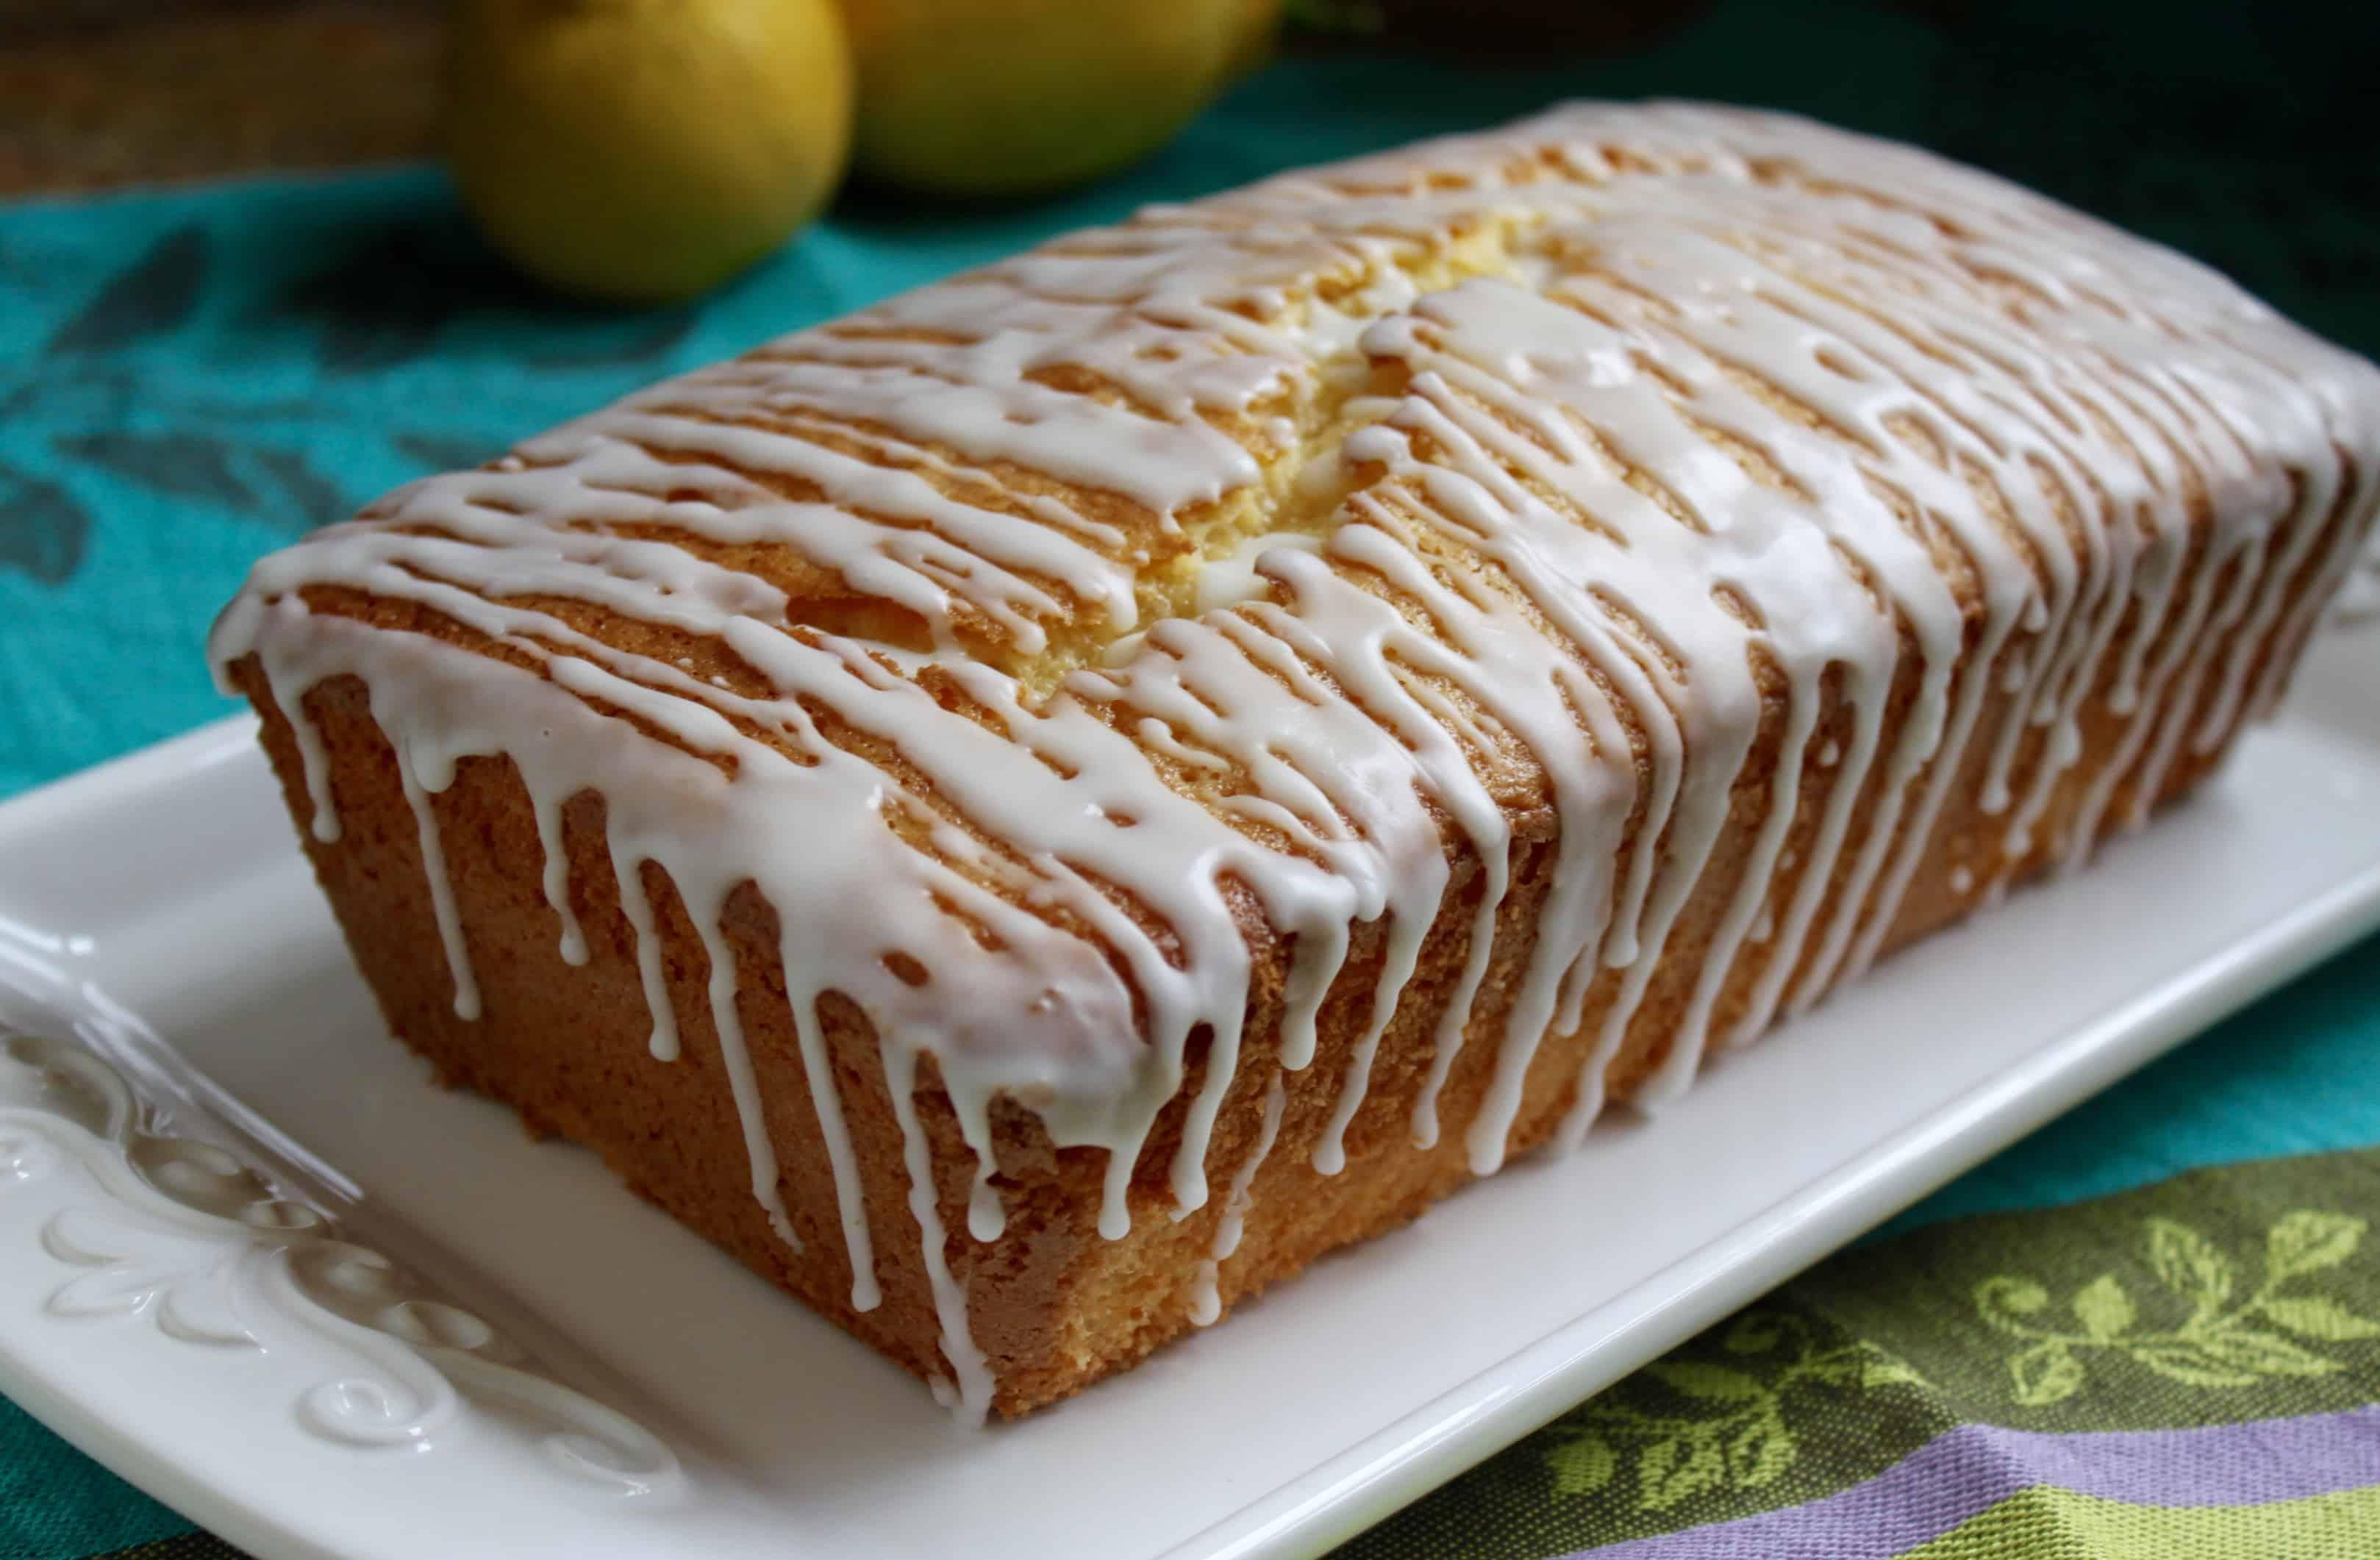 The Best Gluten Free Lemon Or Orange Pound Cake Ever